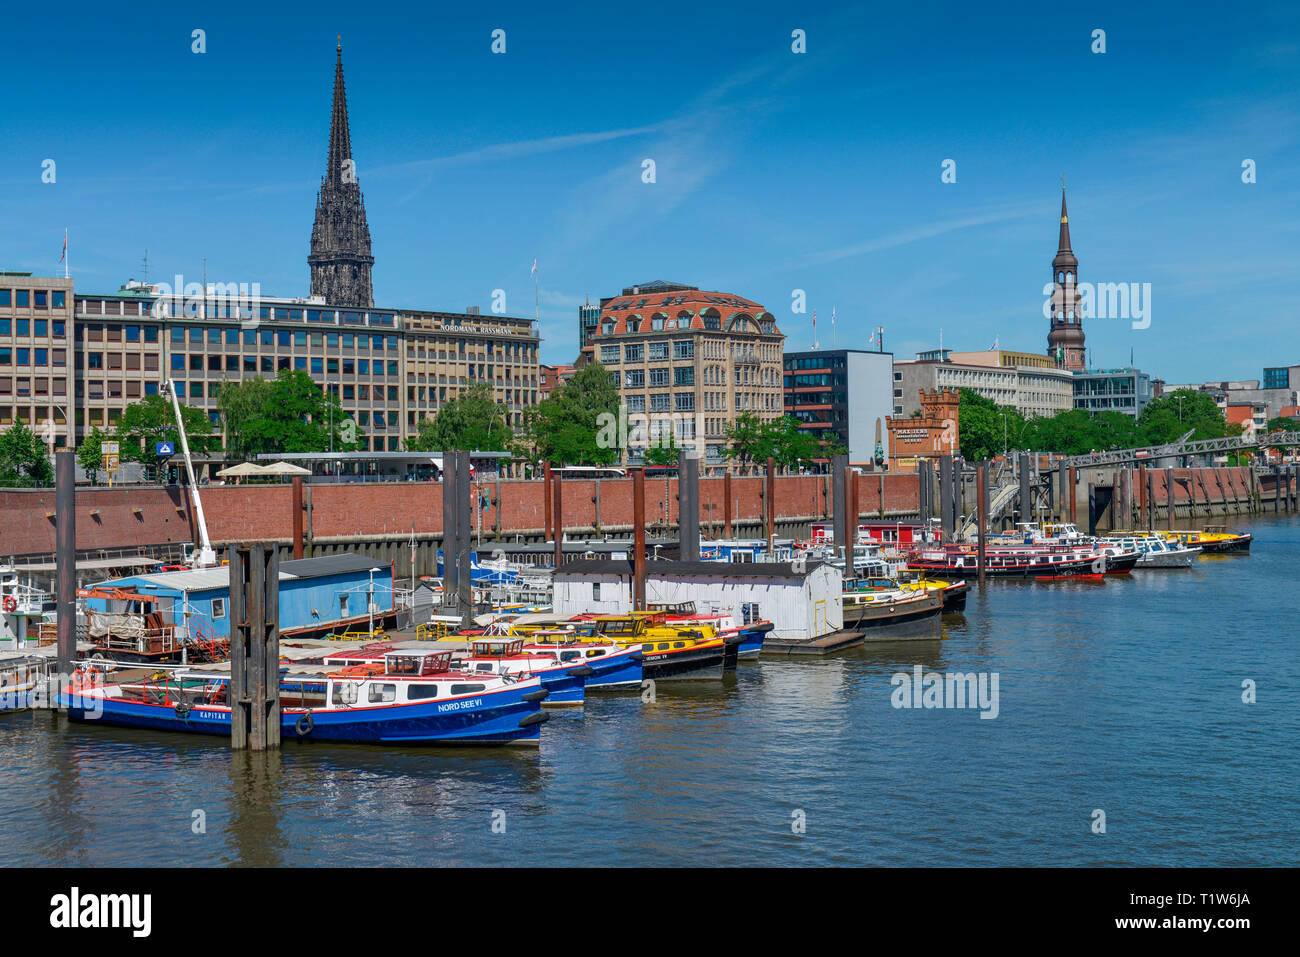 Barkassen, Binnenhafen, Hohe Bruecke, Hamburg, Deutschland - Stock Image